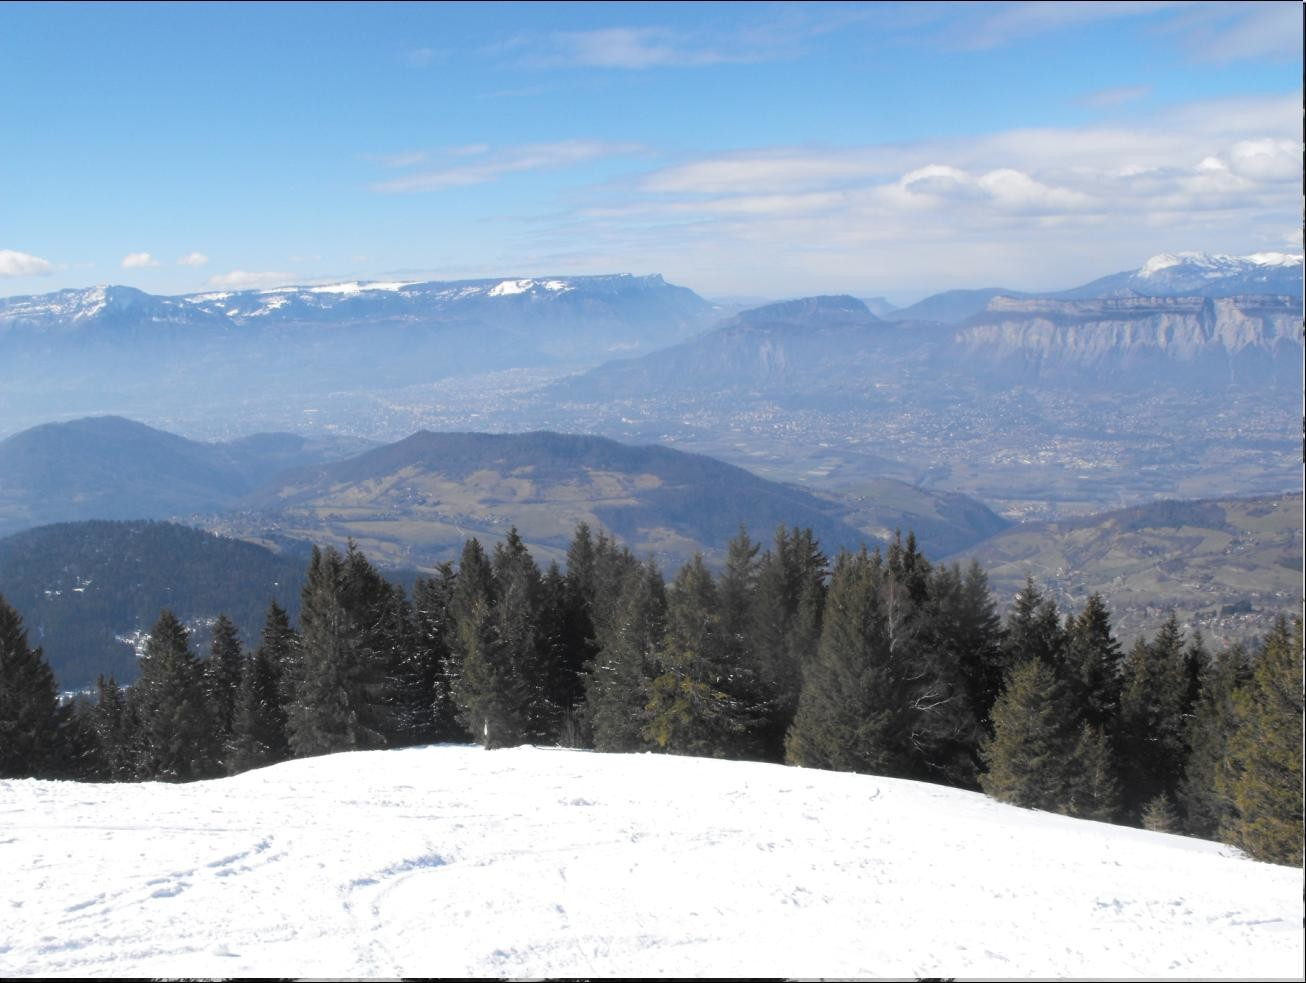 Vallée de Grenoble